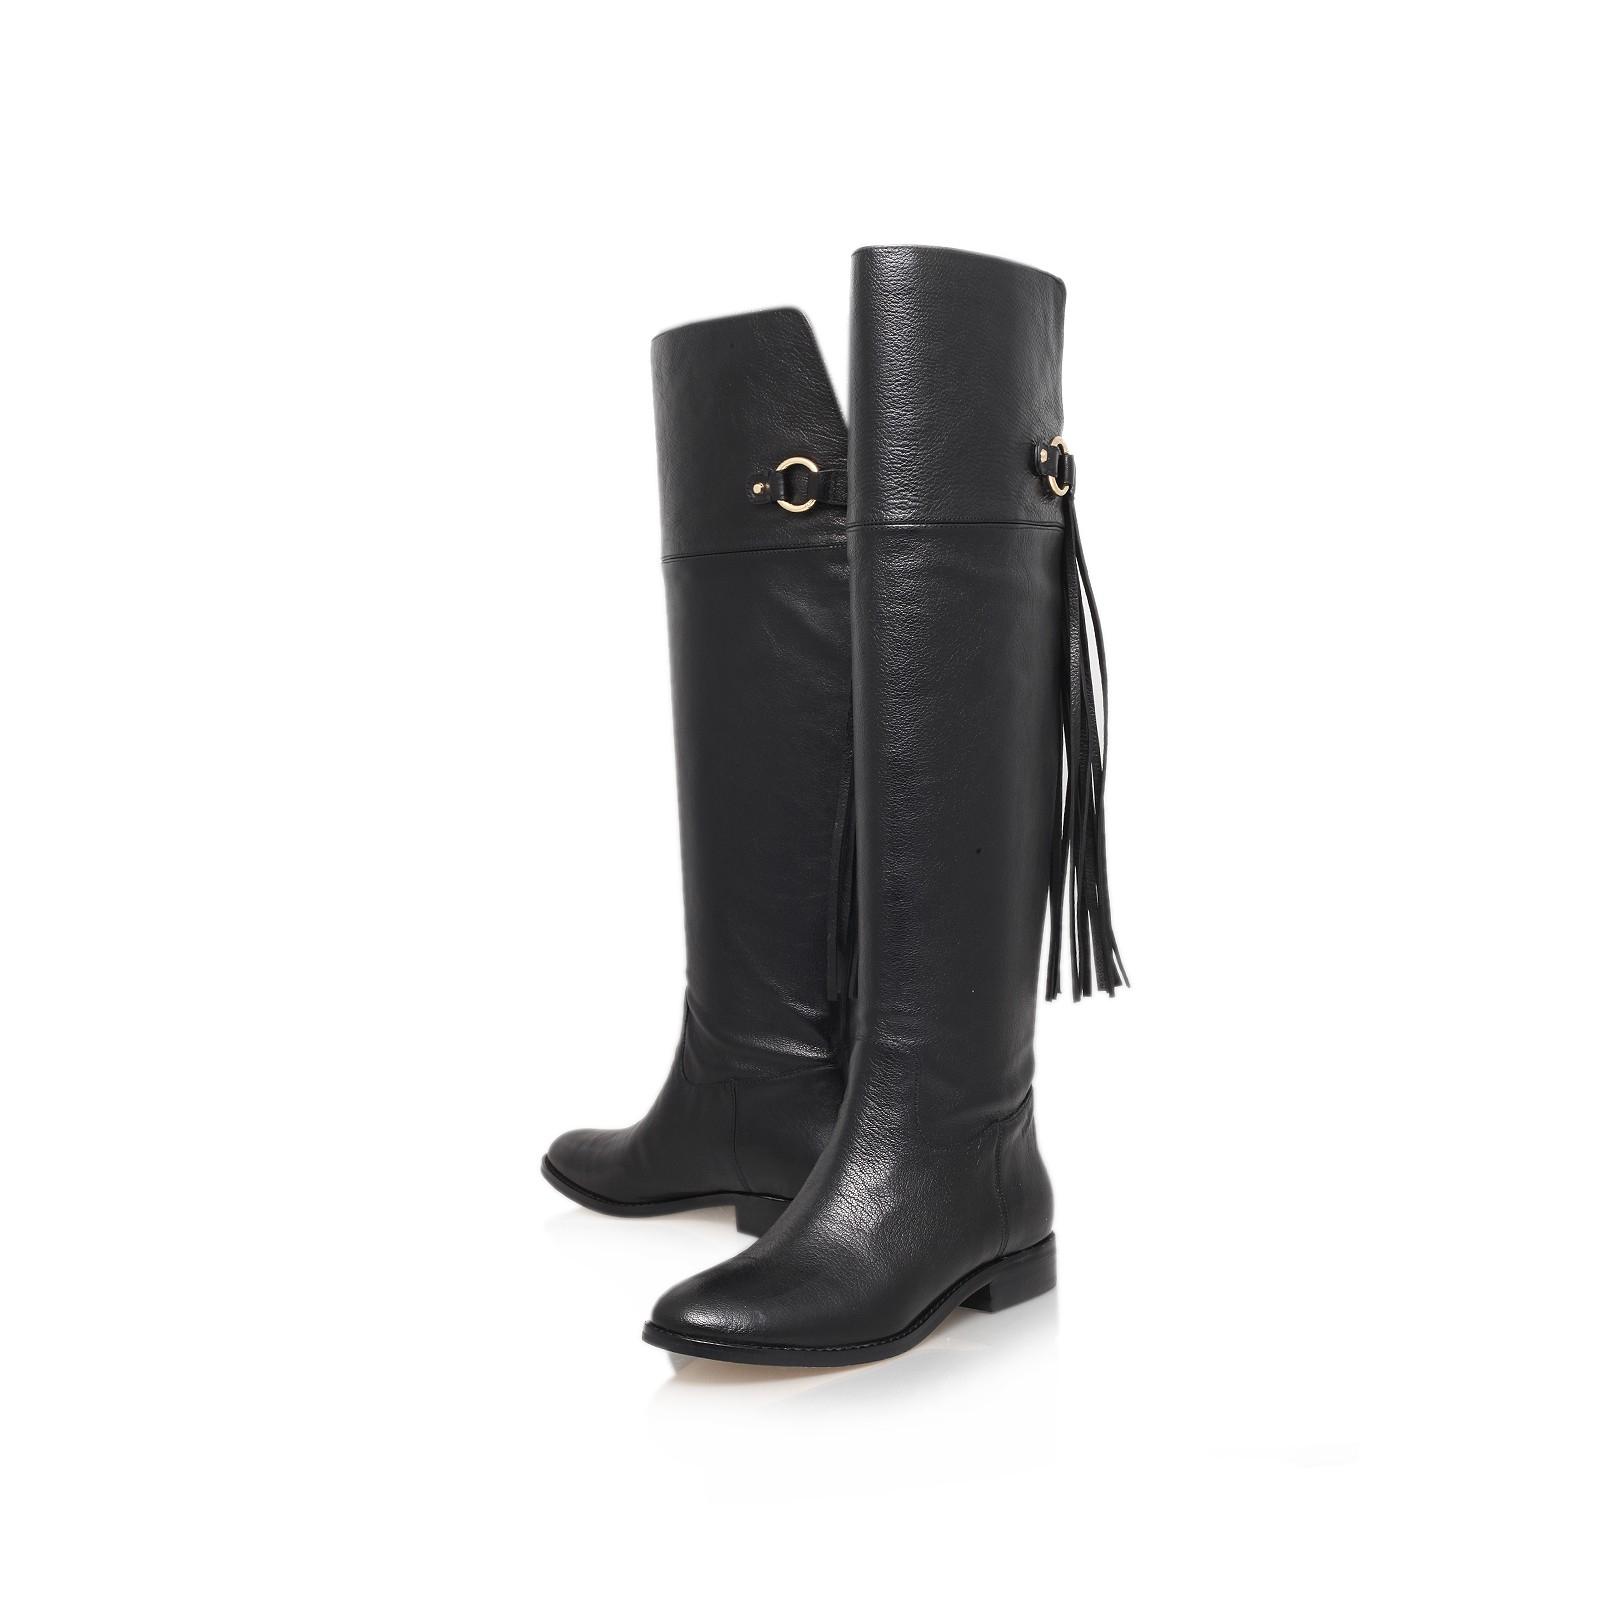 a9ce4a22a35 MICHAEL Michael Kors Rhea Flat Boot in Black - Lyst